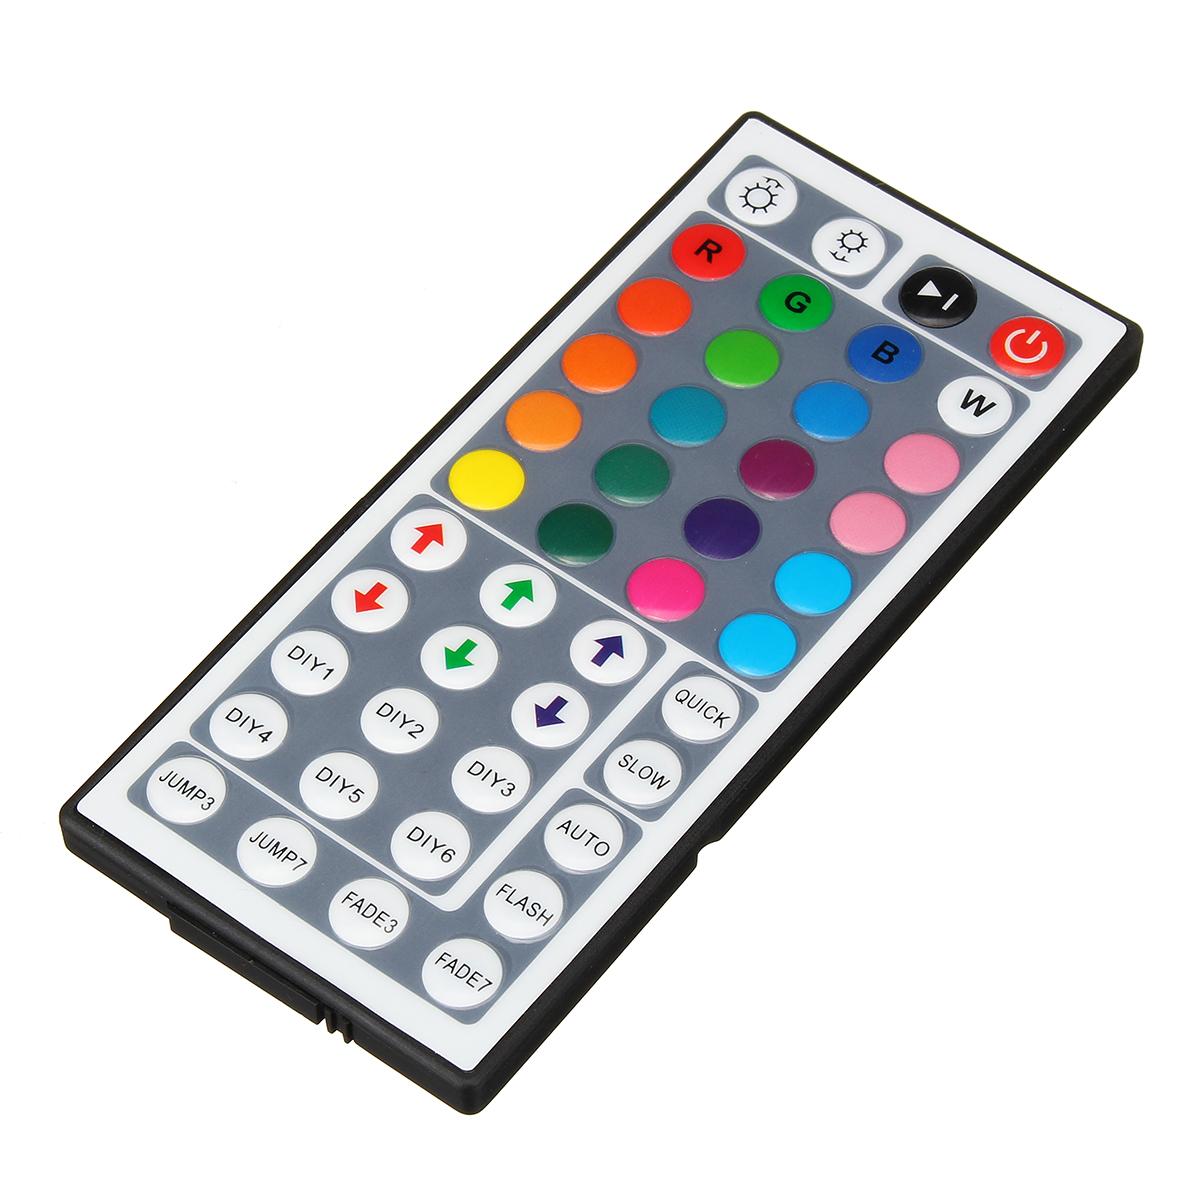 DC12V 6A 72W 44 Key IR Remote Controller for RGB LED Strip Lights